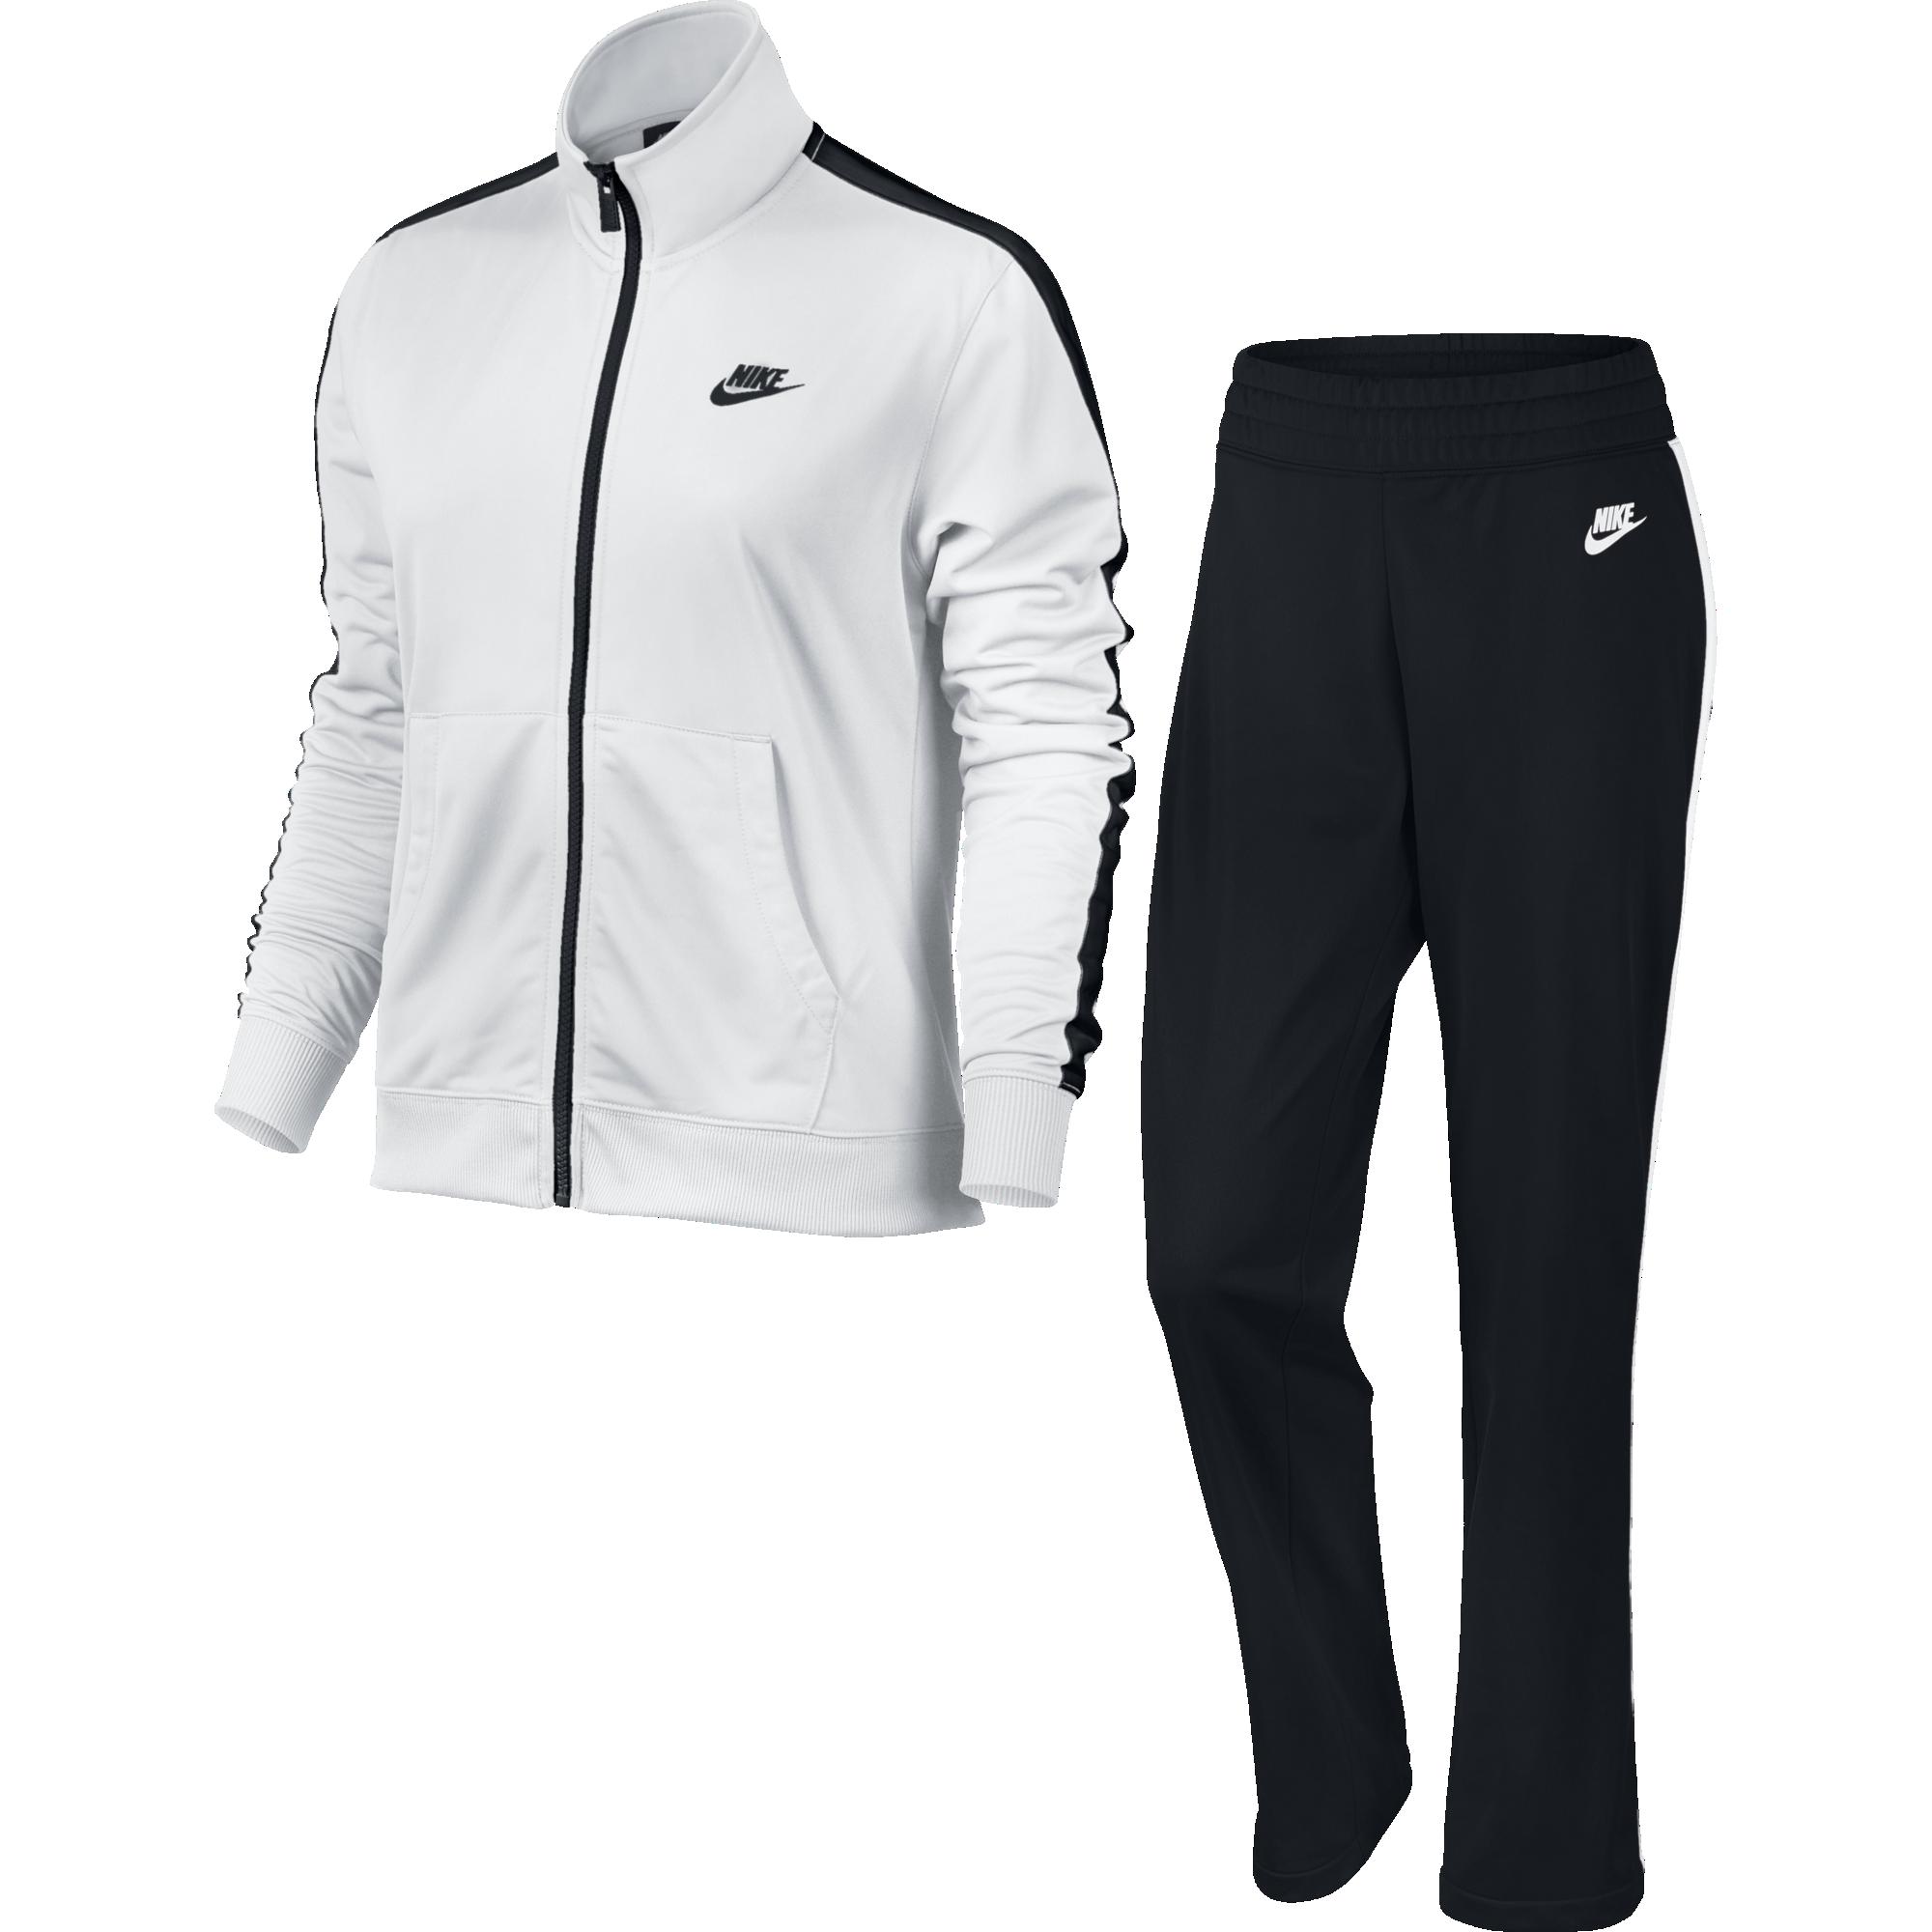 c39ac07e63 Nike Womens Nike Sportswear Track Suit 830345-100 Női Melegítő ...